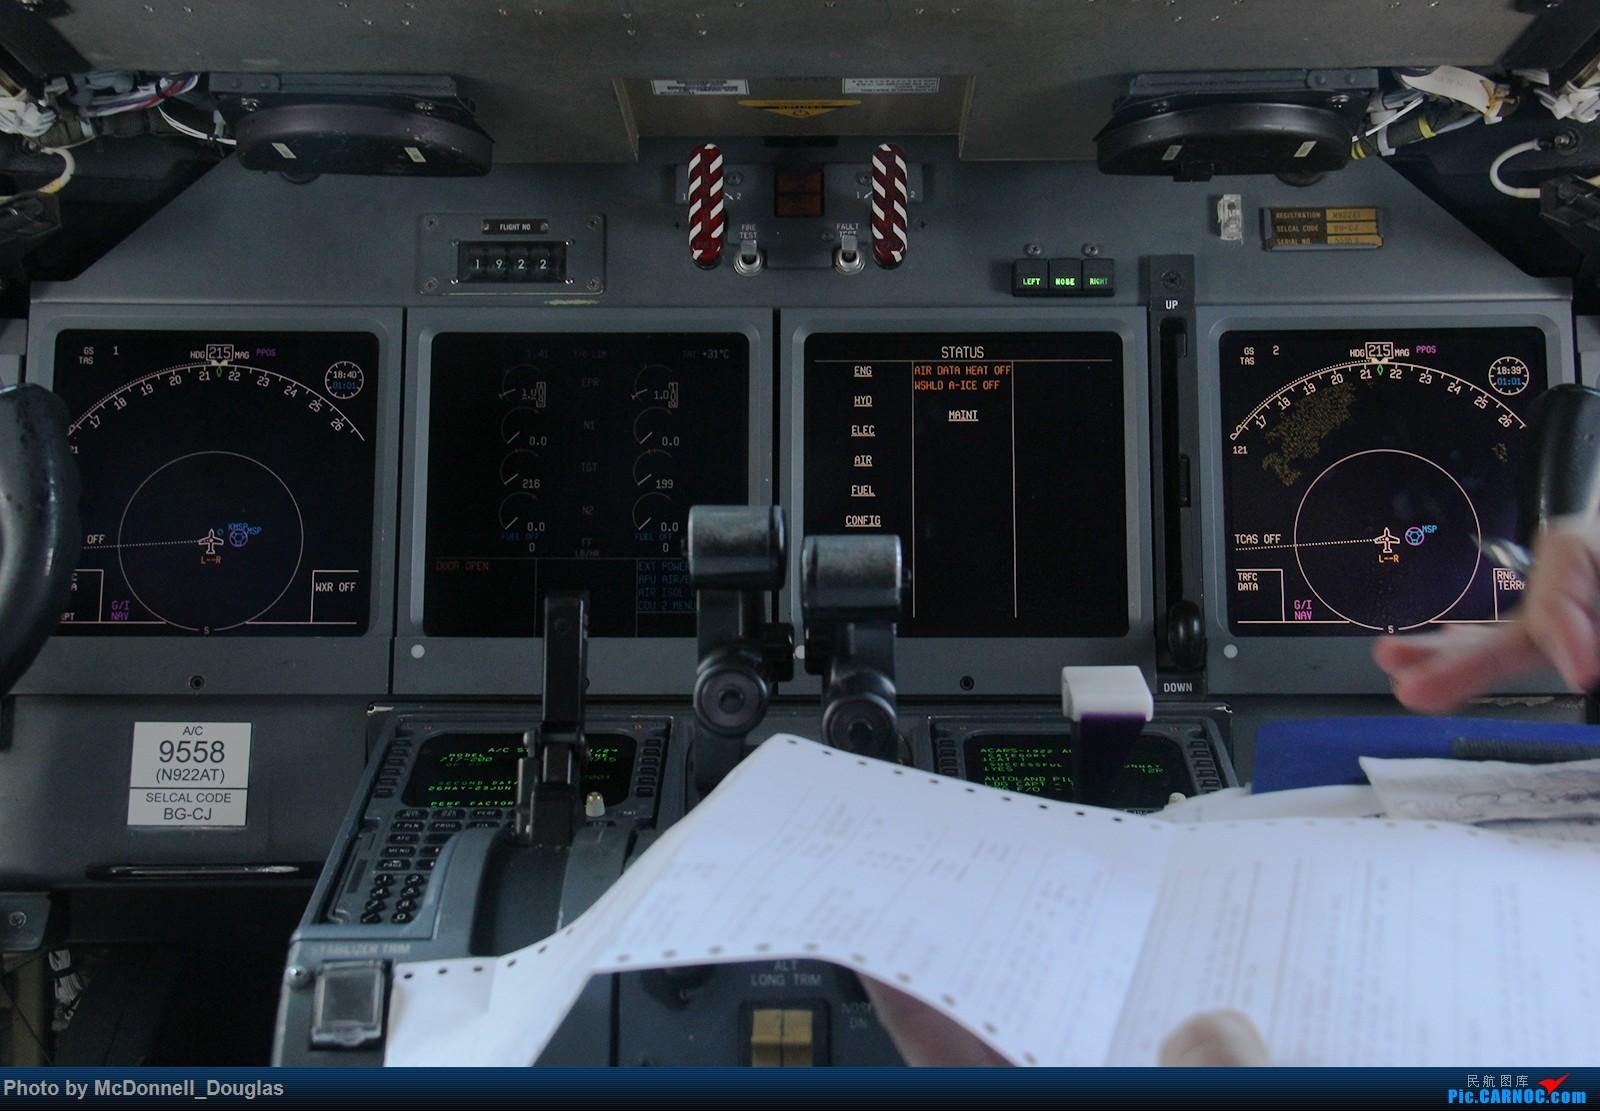 Re:[原创]【上海飞友会】图会很多,也有很多驾驶舱,杂七杂八的美帝,梦寐以求的圣马丁,这更绝不弃贴【驾驶舱已出现】 BOEING717-2BD N922AT 美国明尼阿波利斯—圣保罗机场